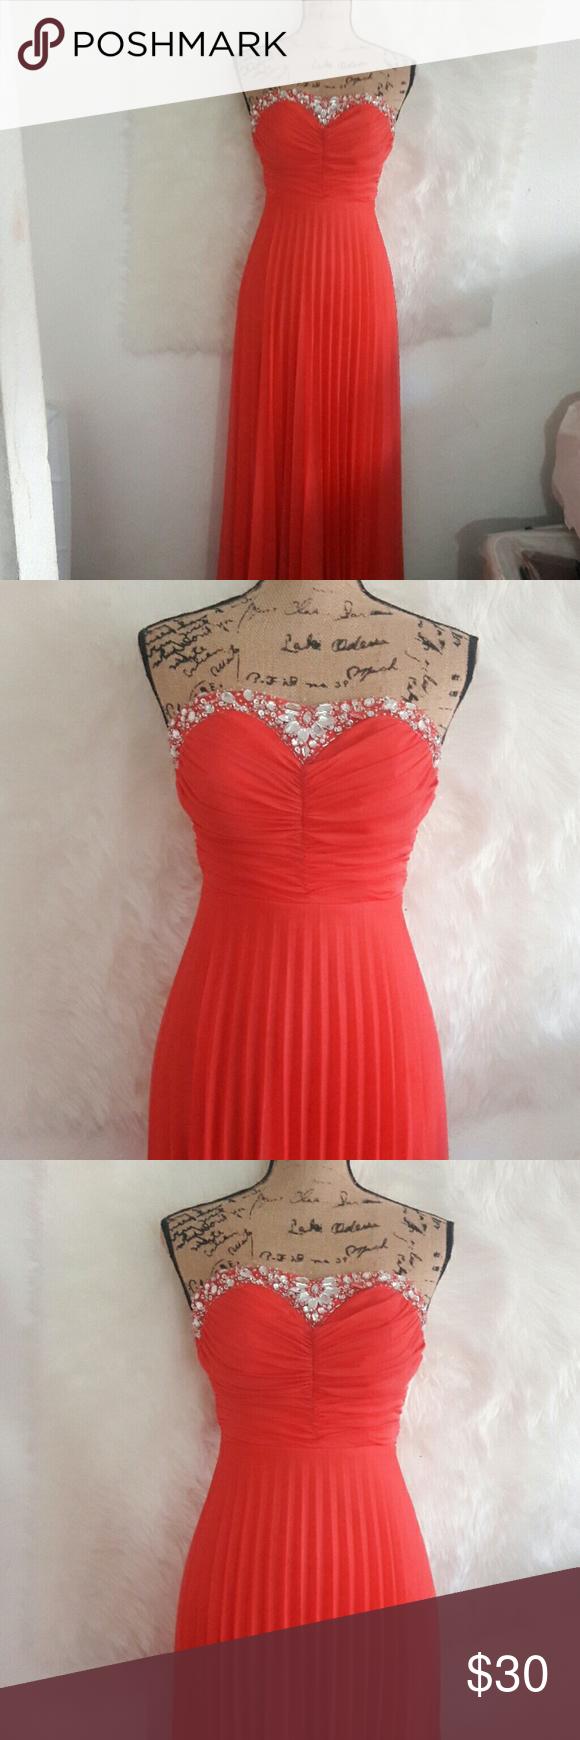 Beautiful coral embelished homecoming dress homecoming dresses